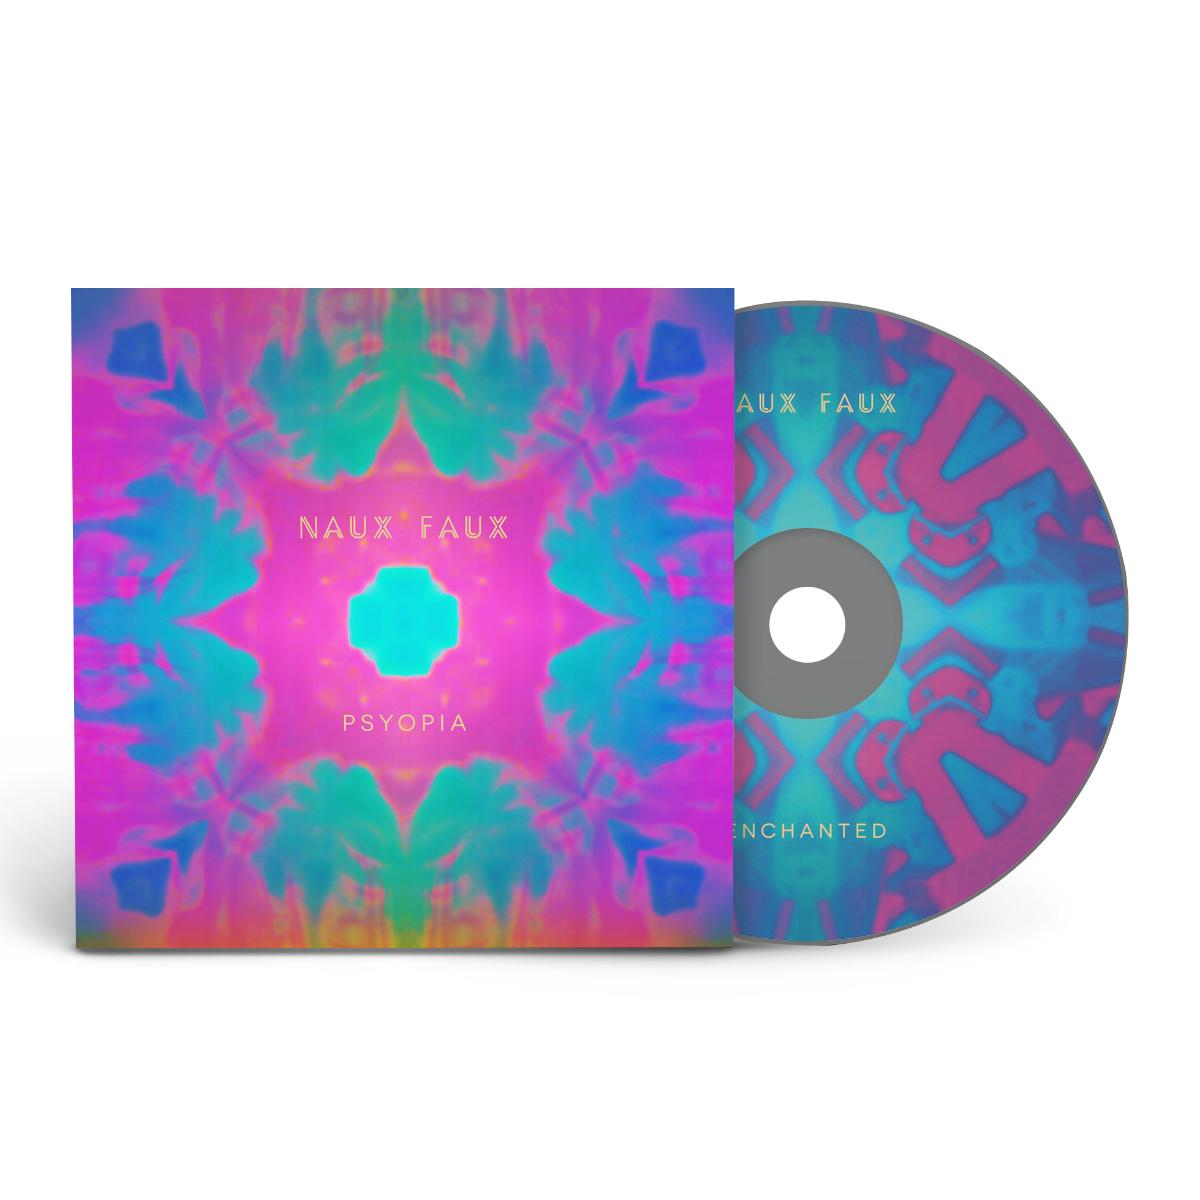 Naux Faux - Enchanted CD